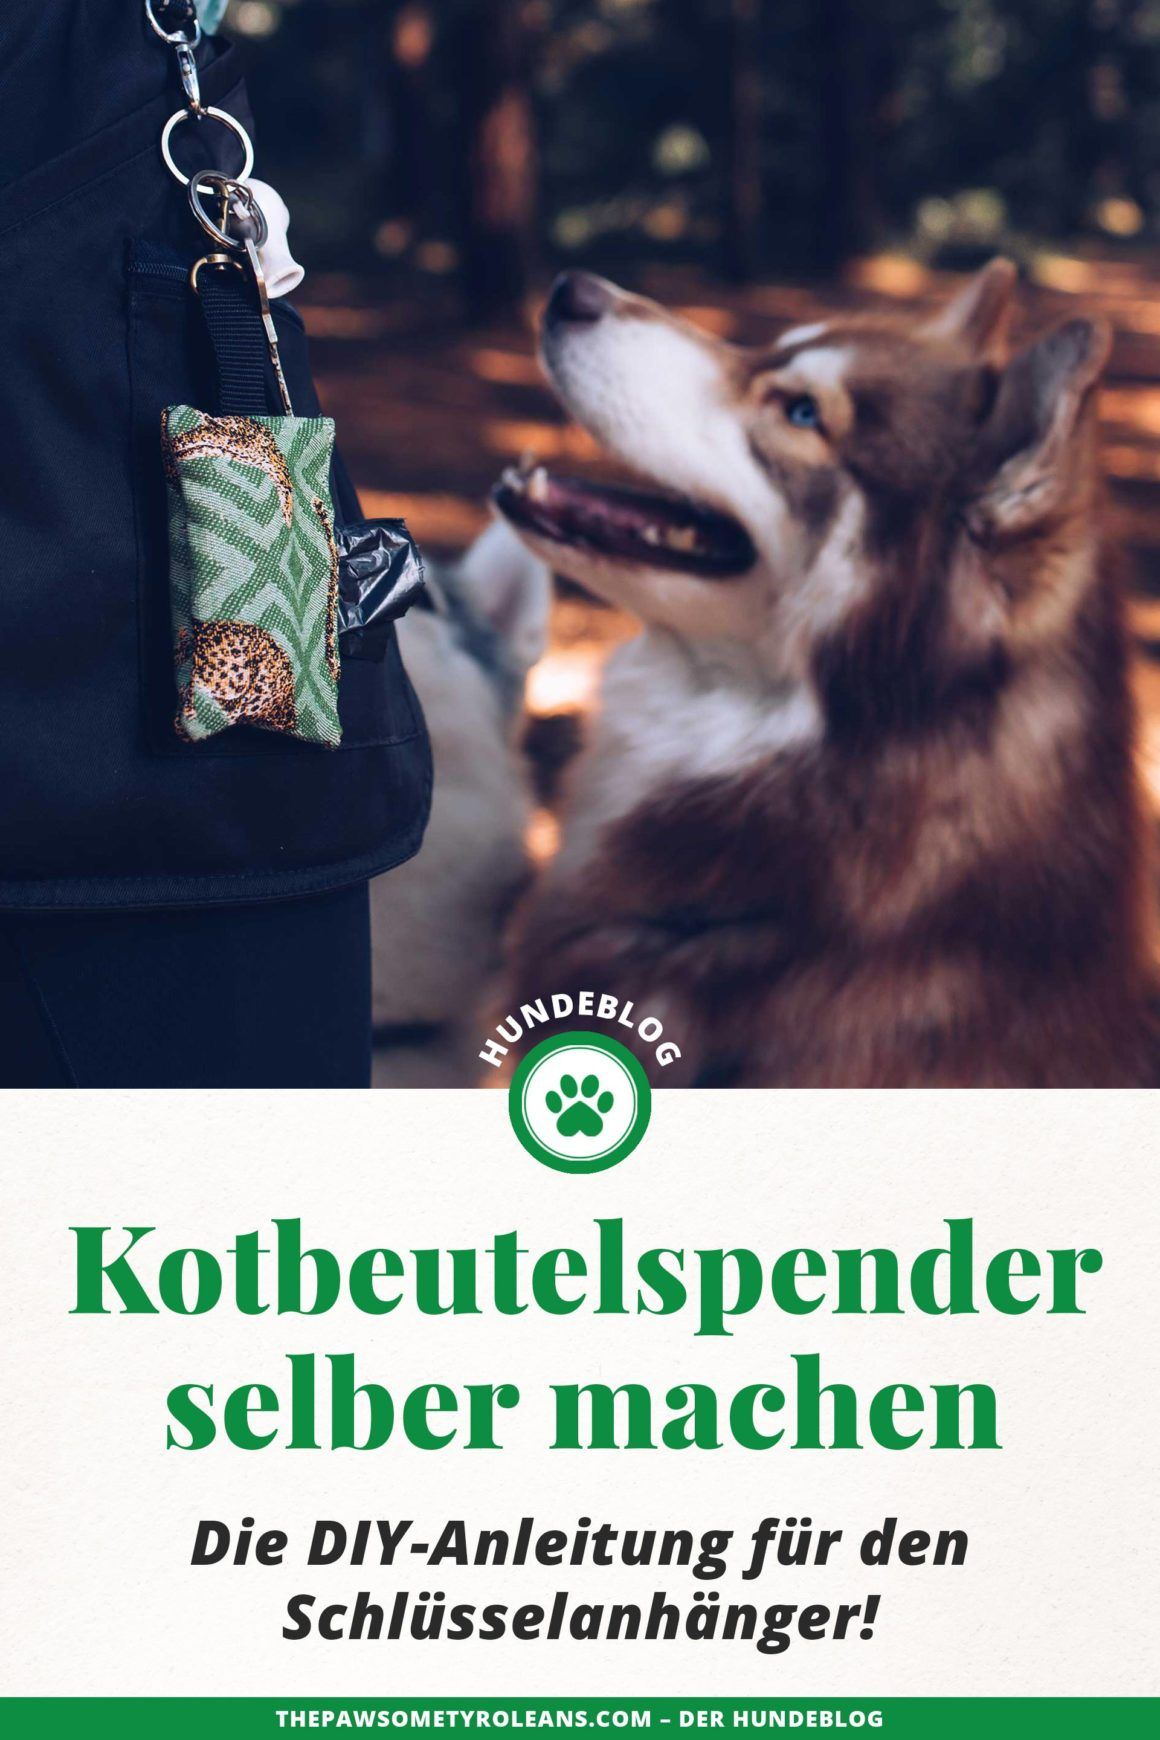 Enthalt Unbeauftragte Werbung Kotbeutelspender Selber Machen Gassisackerl Spender Kotbeutelspender Nahen Kotbeutelspender D Kotbeutelspender Hund Diy Hunde